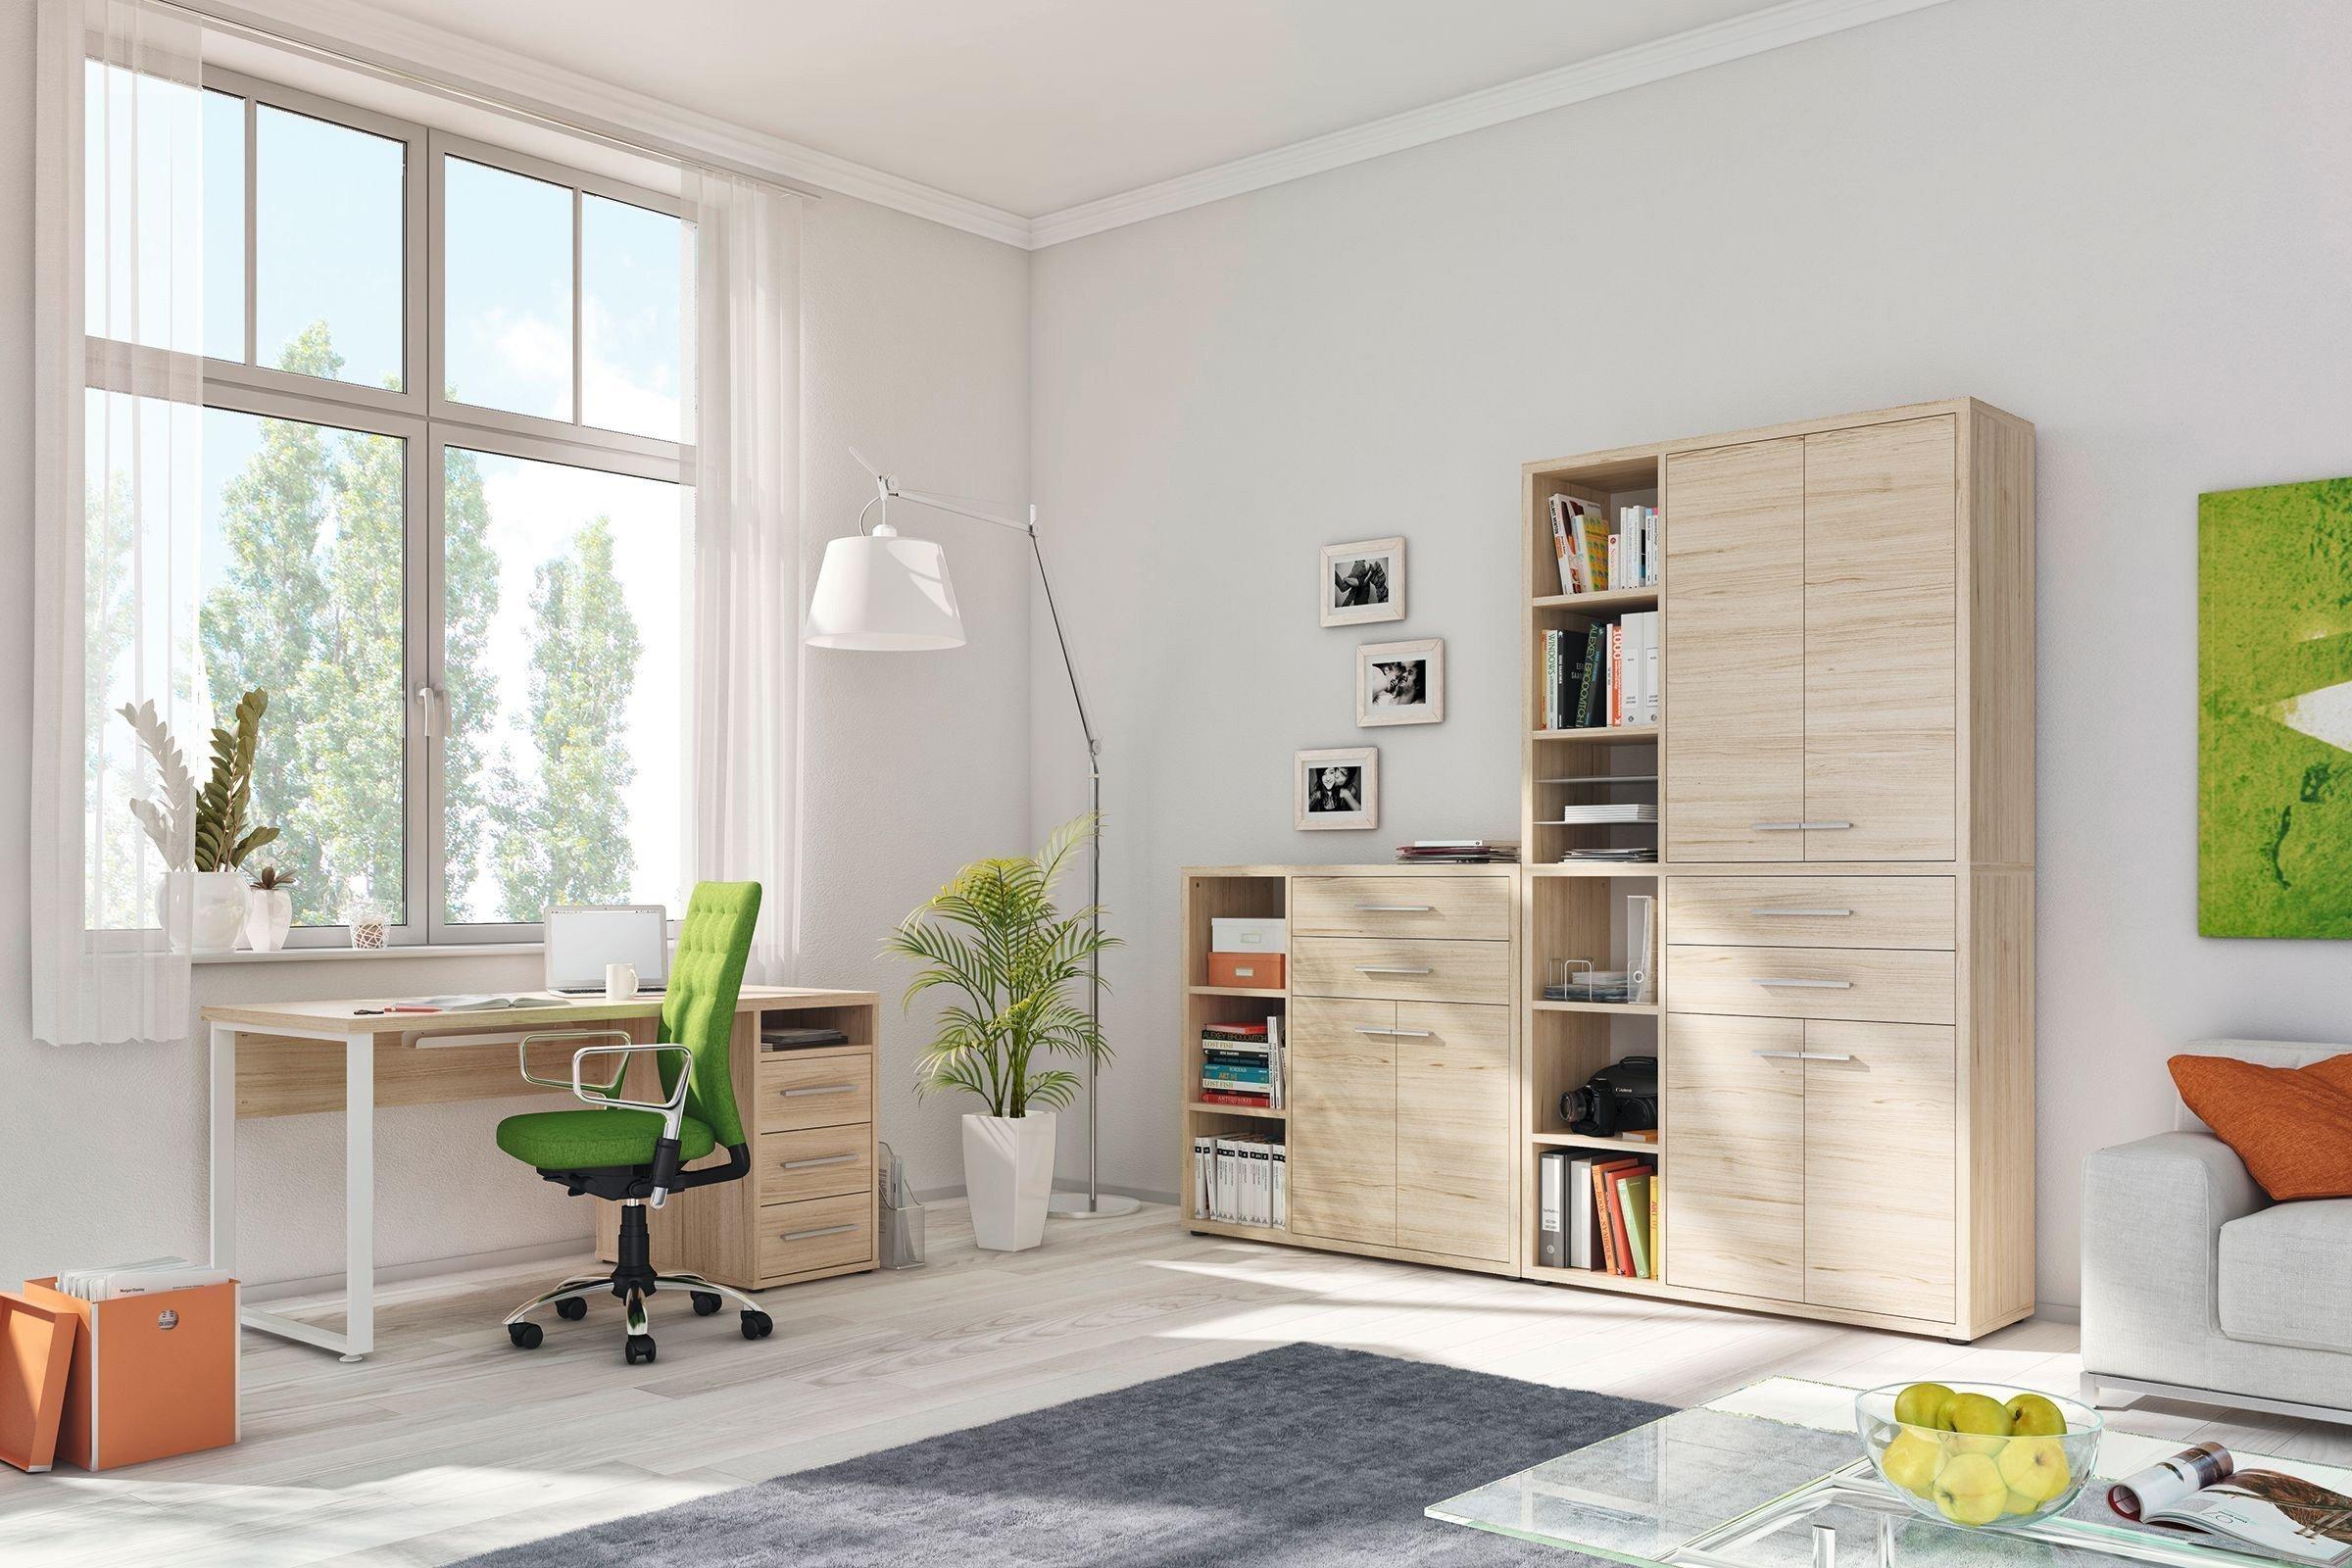 maja b rom bel set in eiche natur m bel letz ihr online shop. Black Bedroom Furniture Sets. Home Design Ideas